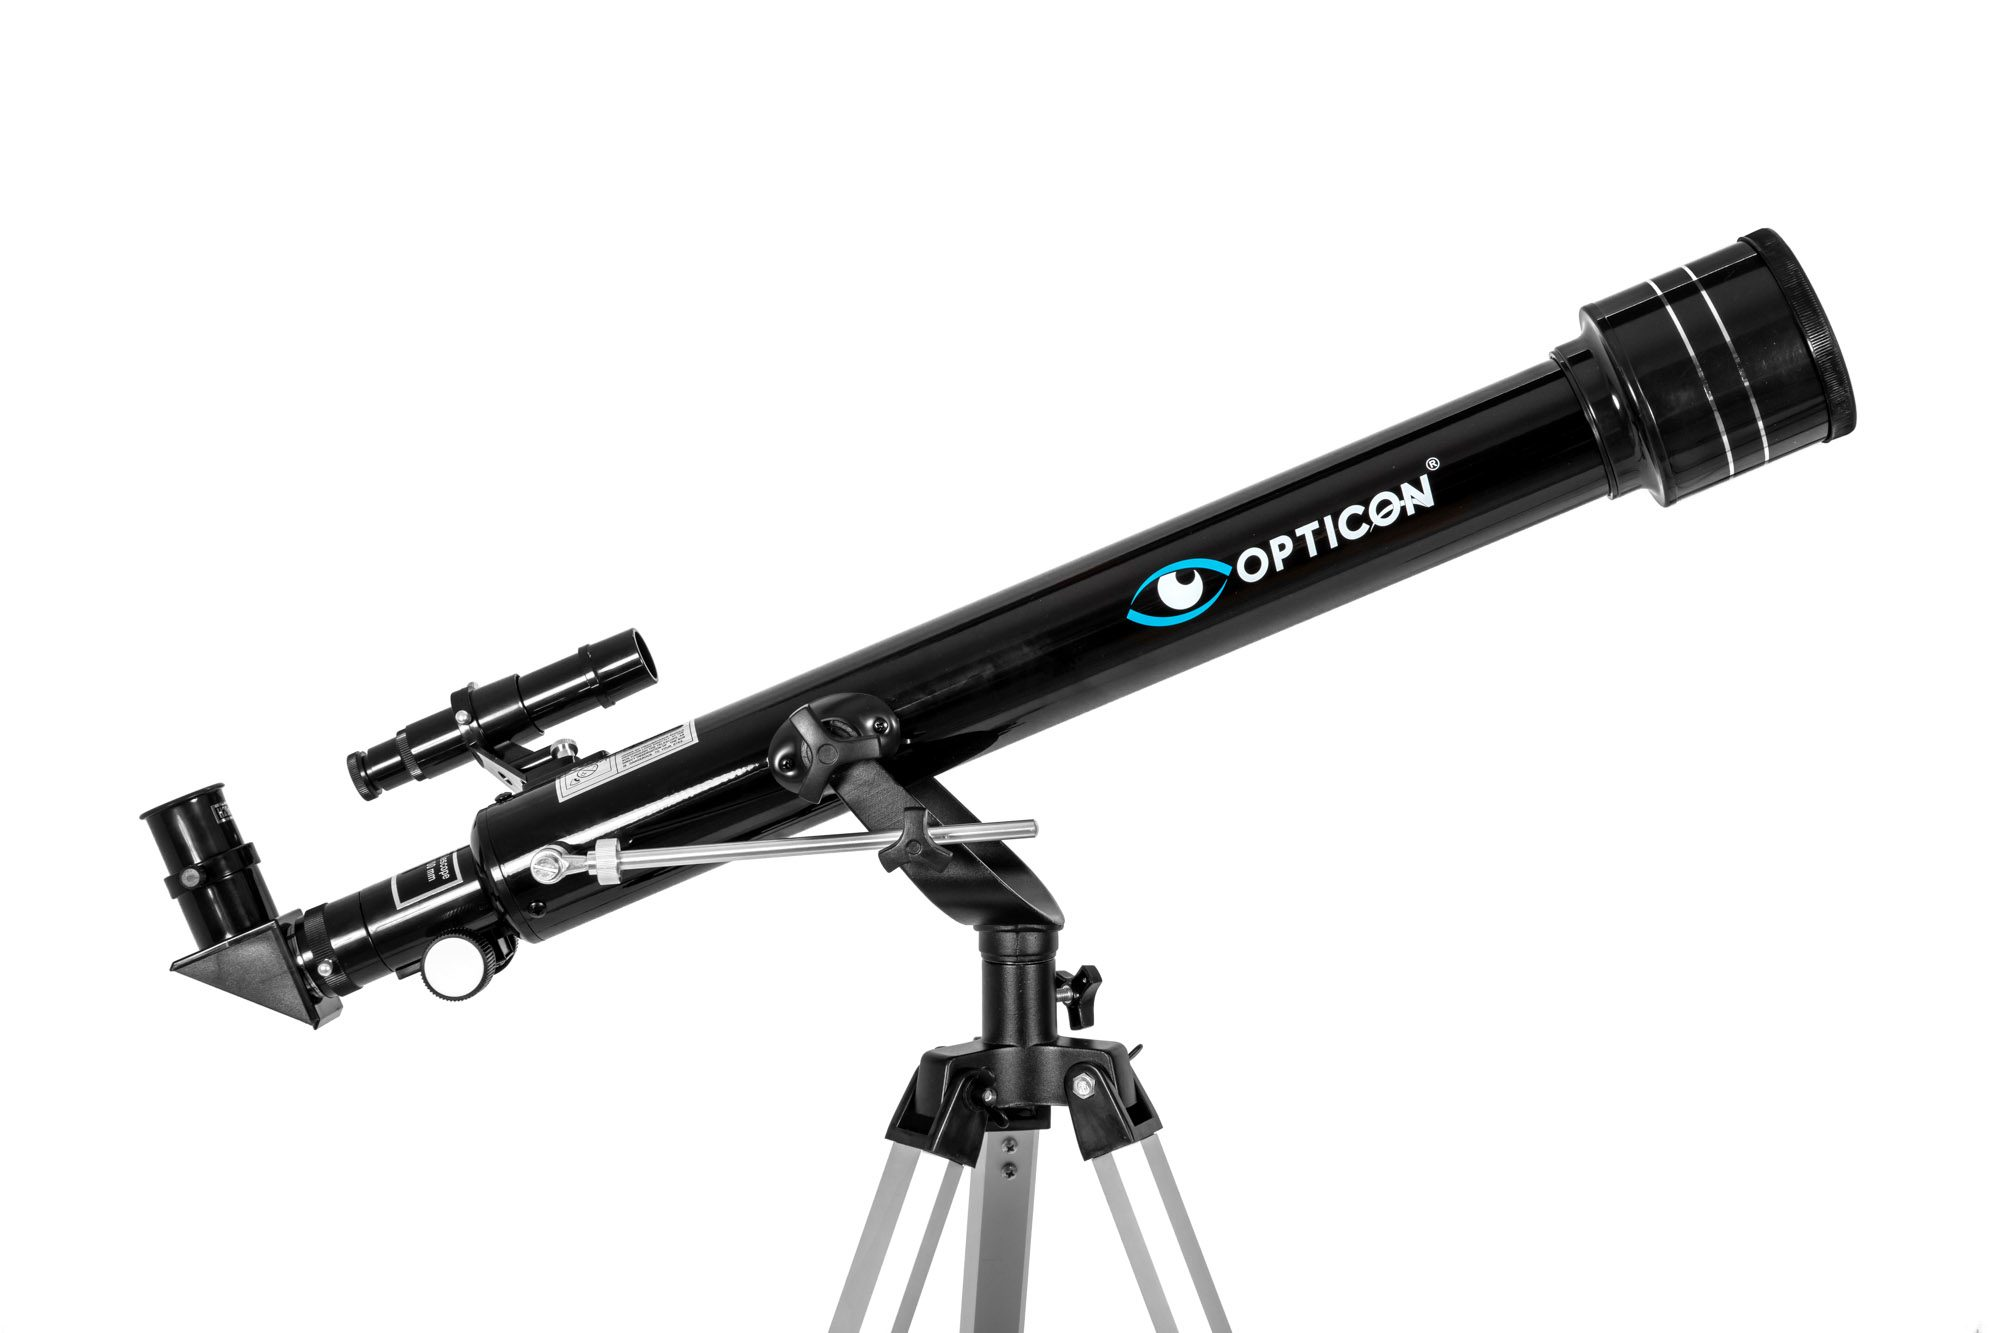 teleskop marki opticon